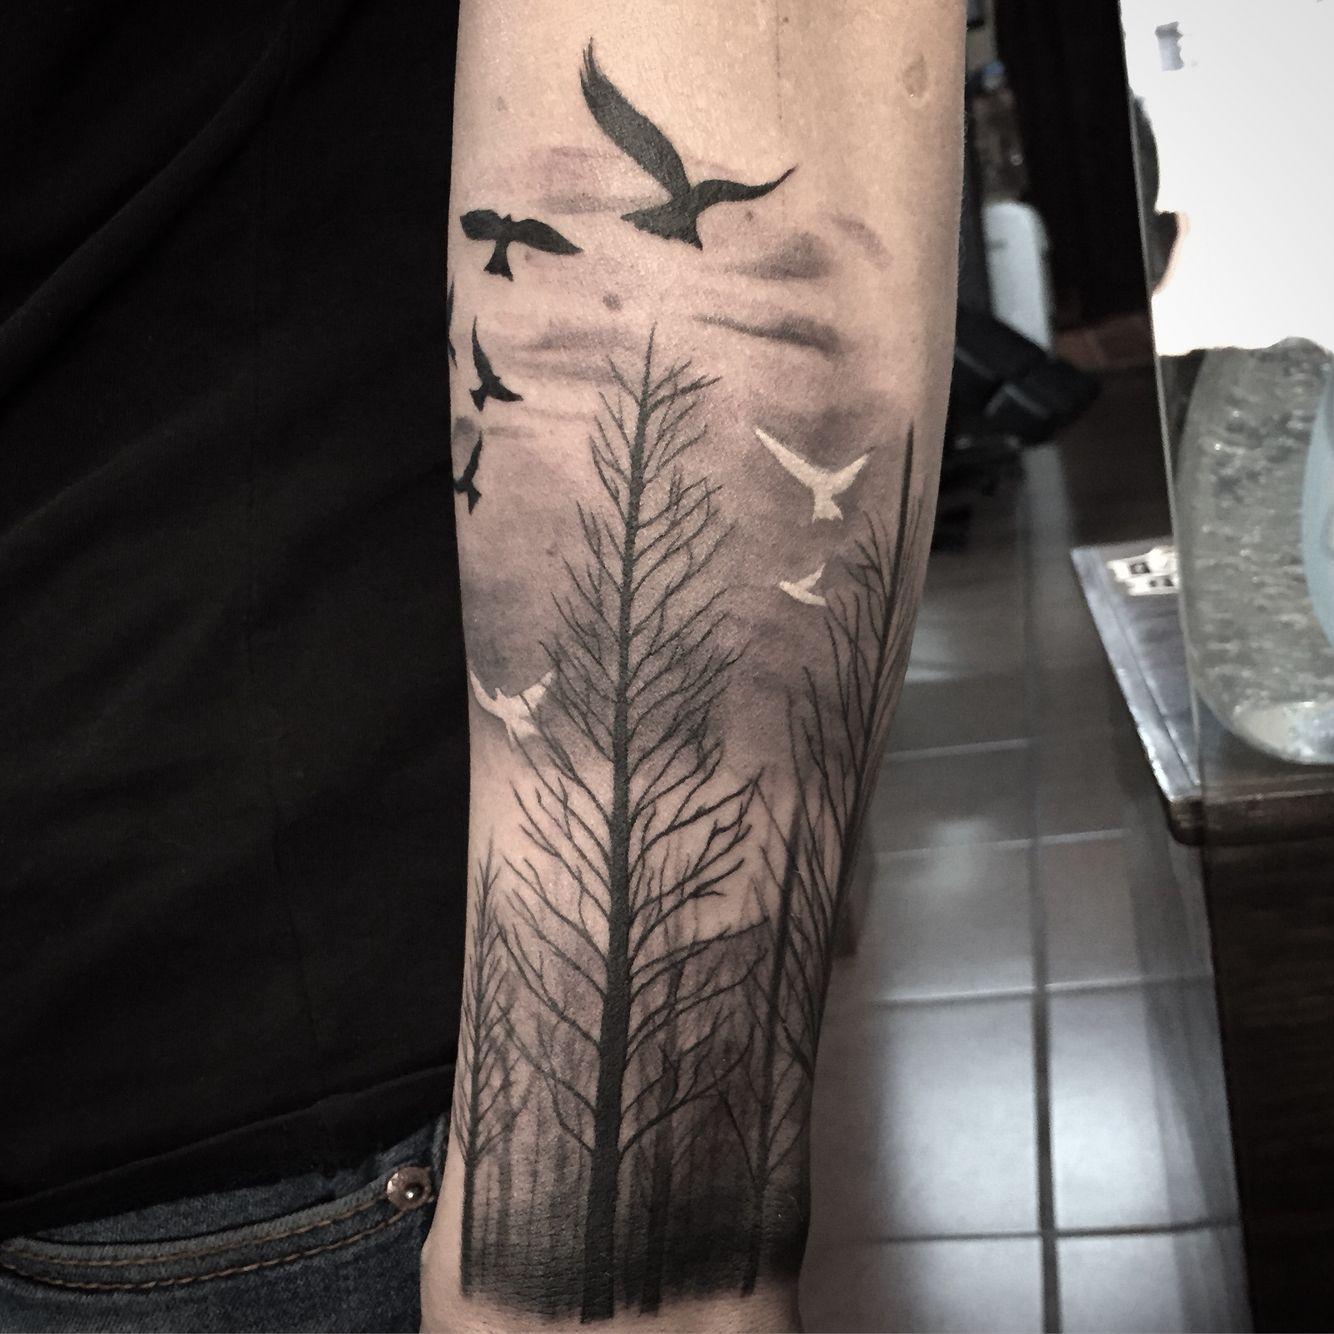 Arboles Tattoo Tatuajes Forestales Tatuajes Impresionantes